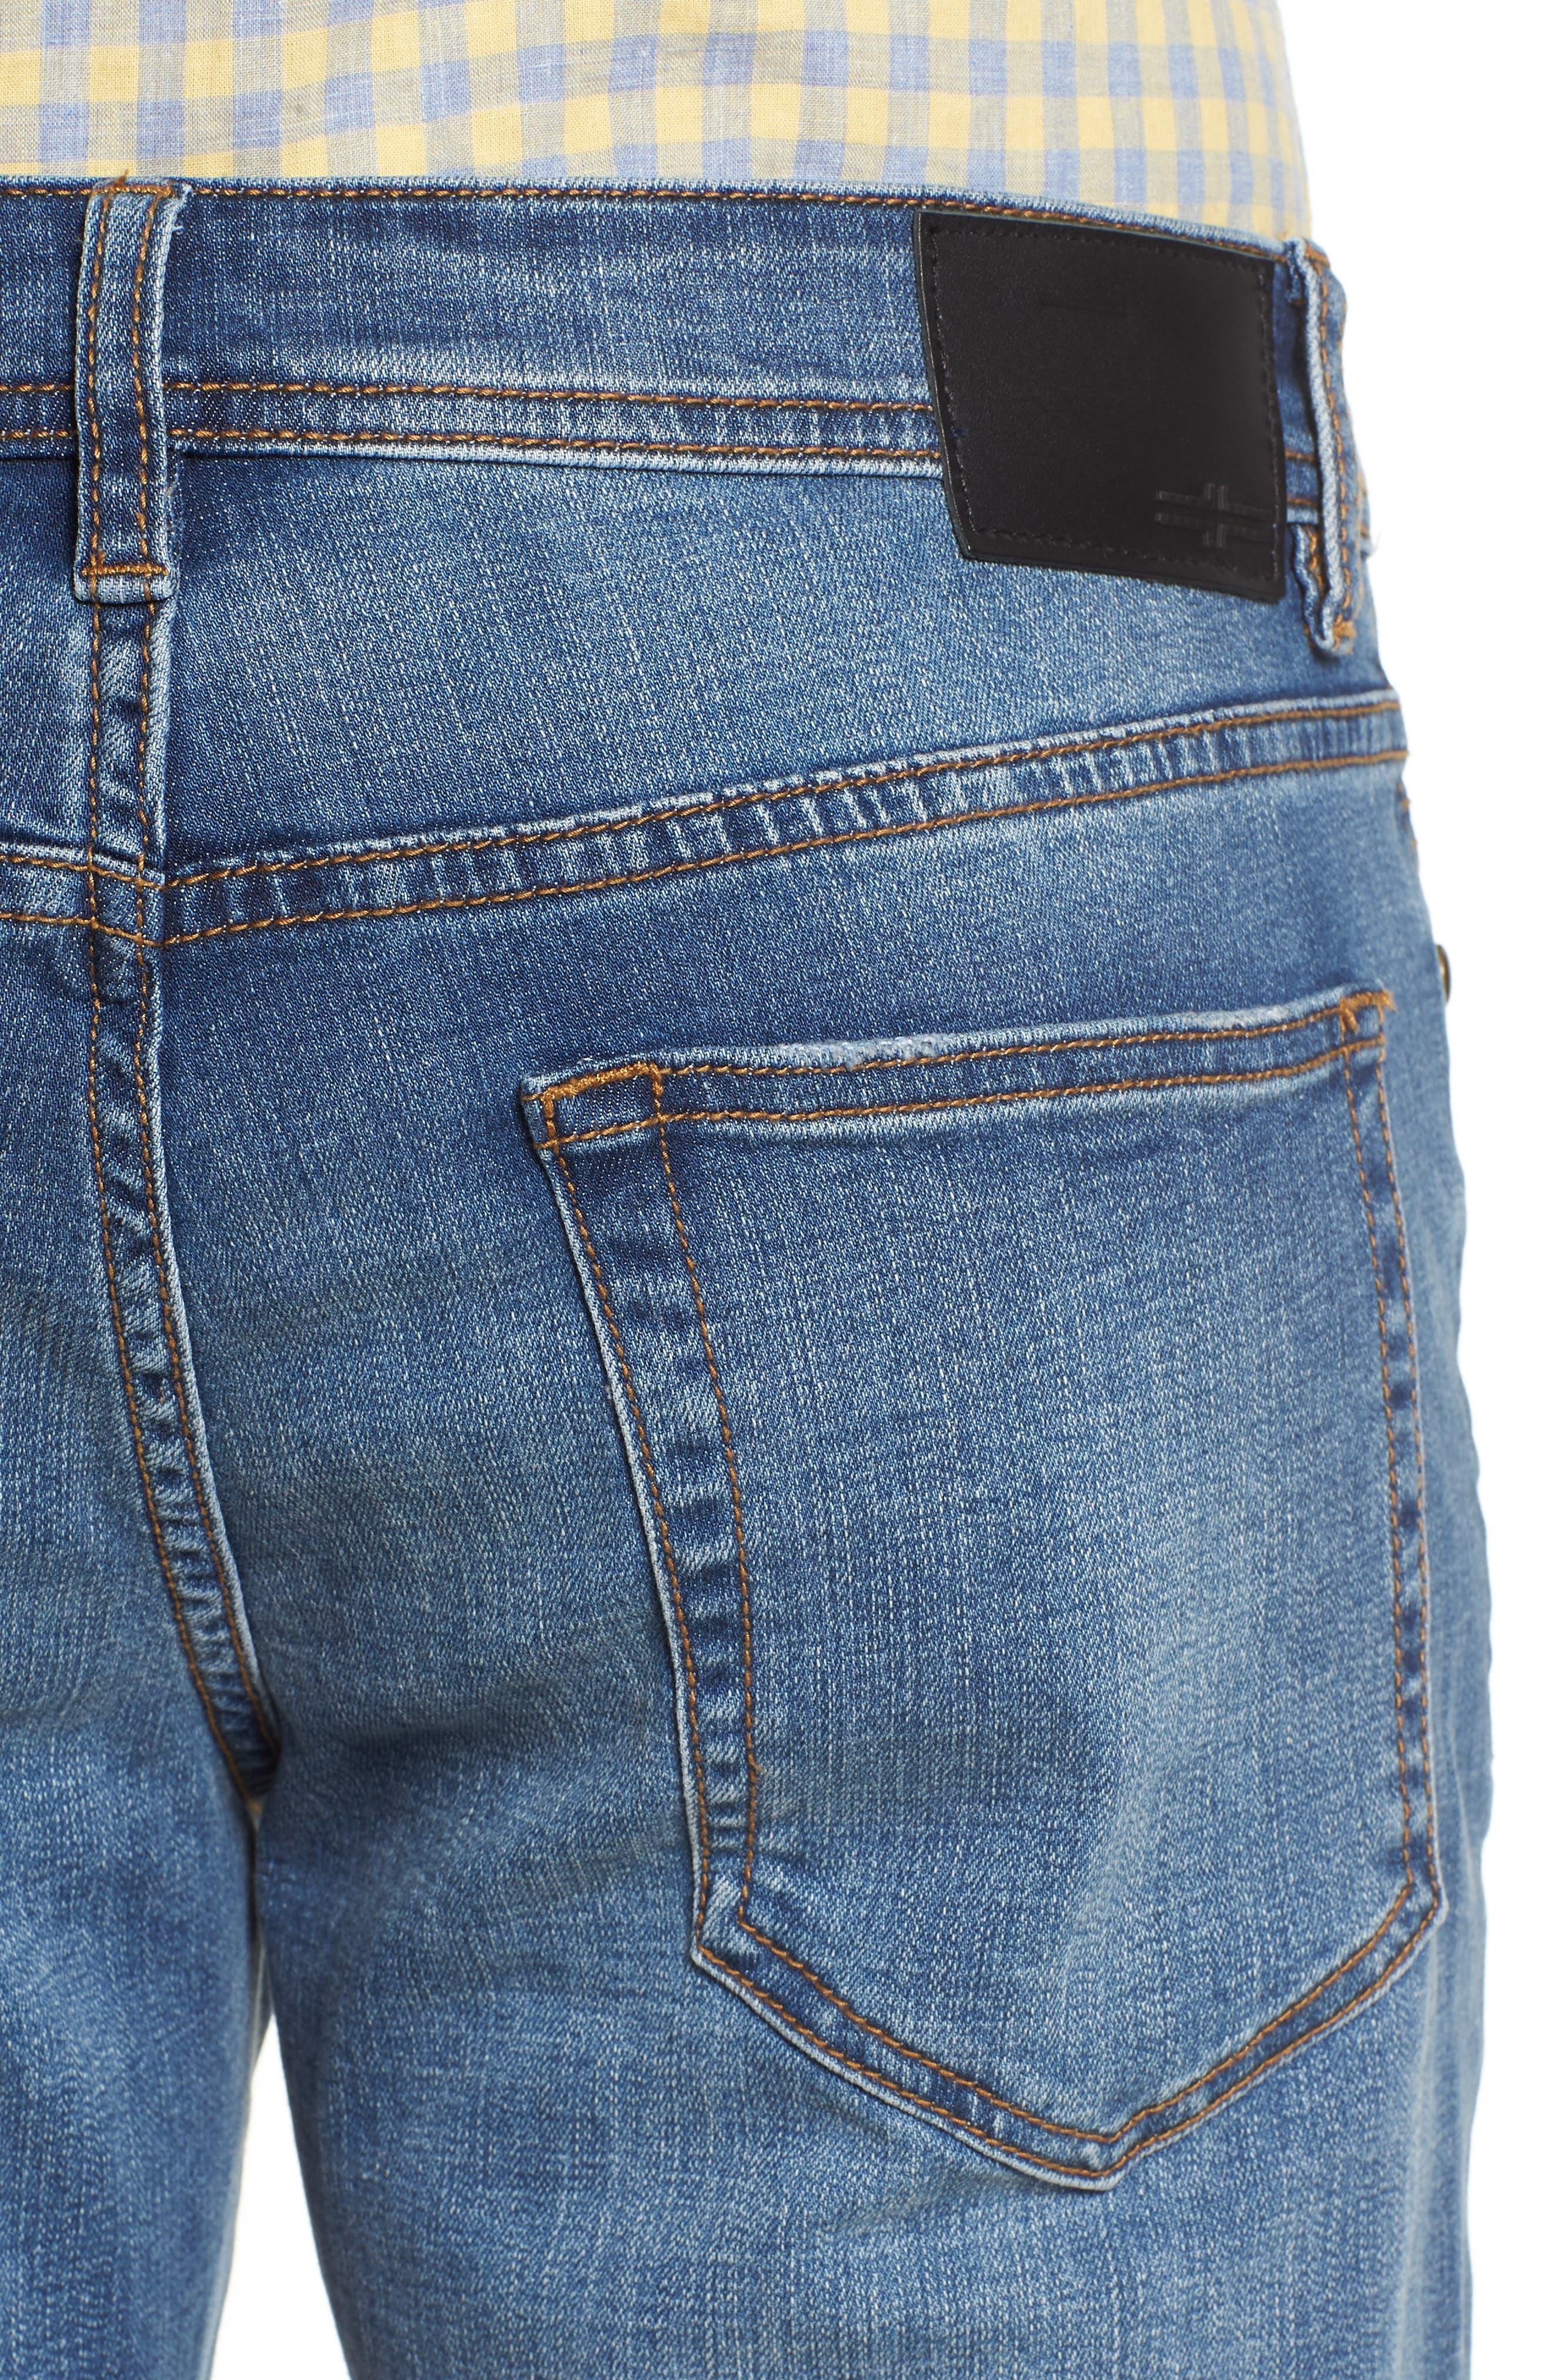 Jeans Co. Regent Relaxed Straight Leg Jeans,                             Alternate thumbnail 4, color,                             Highlander Mid